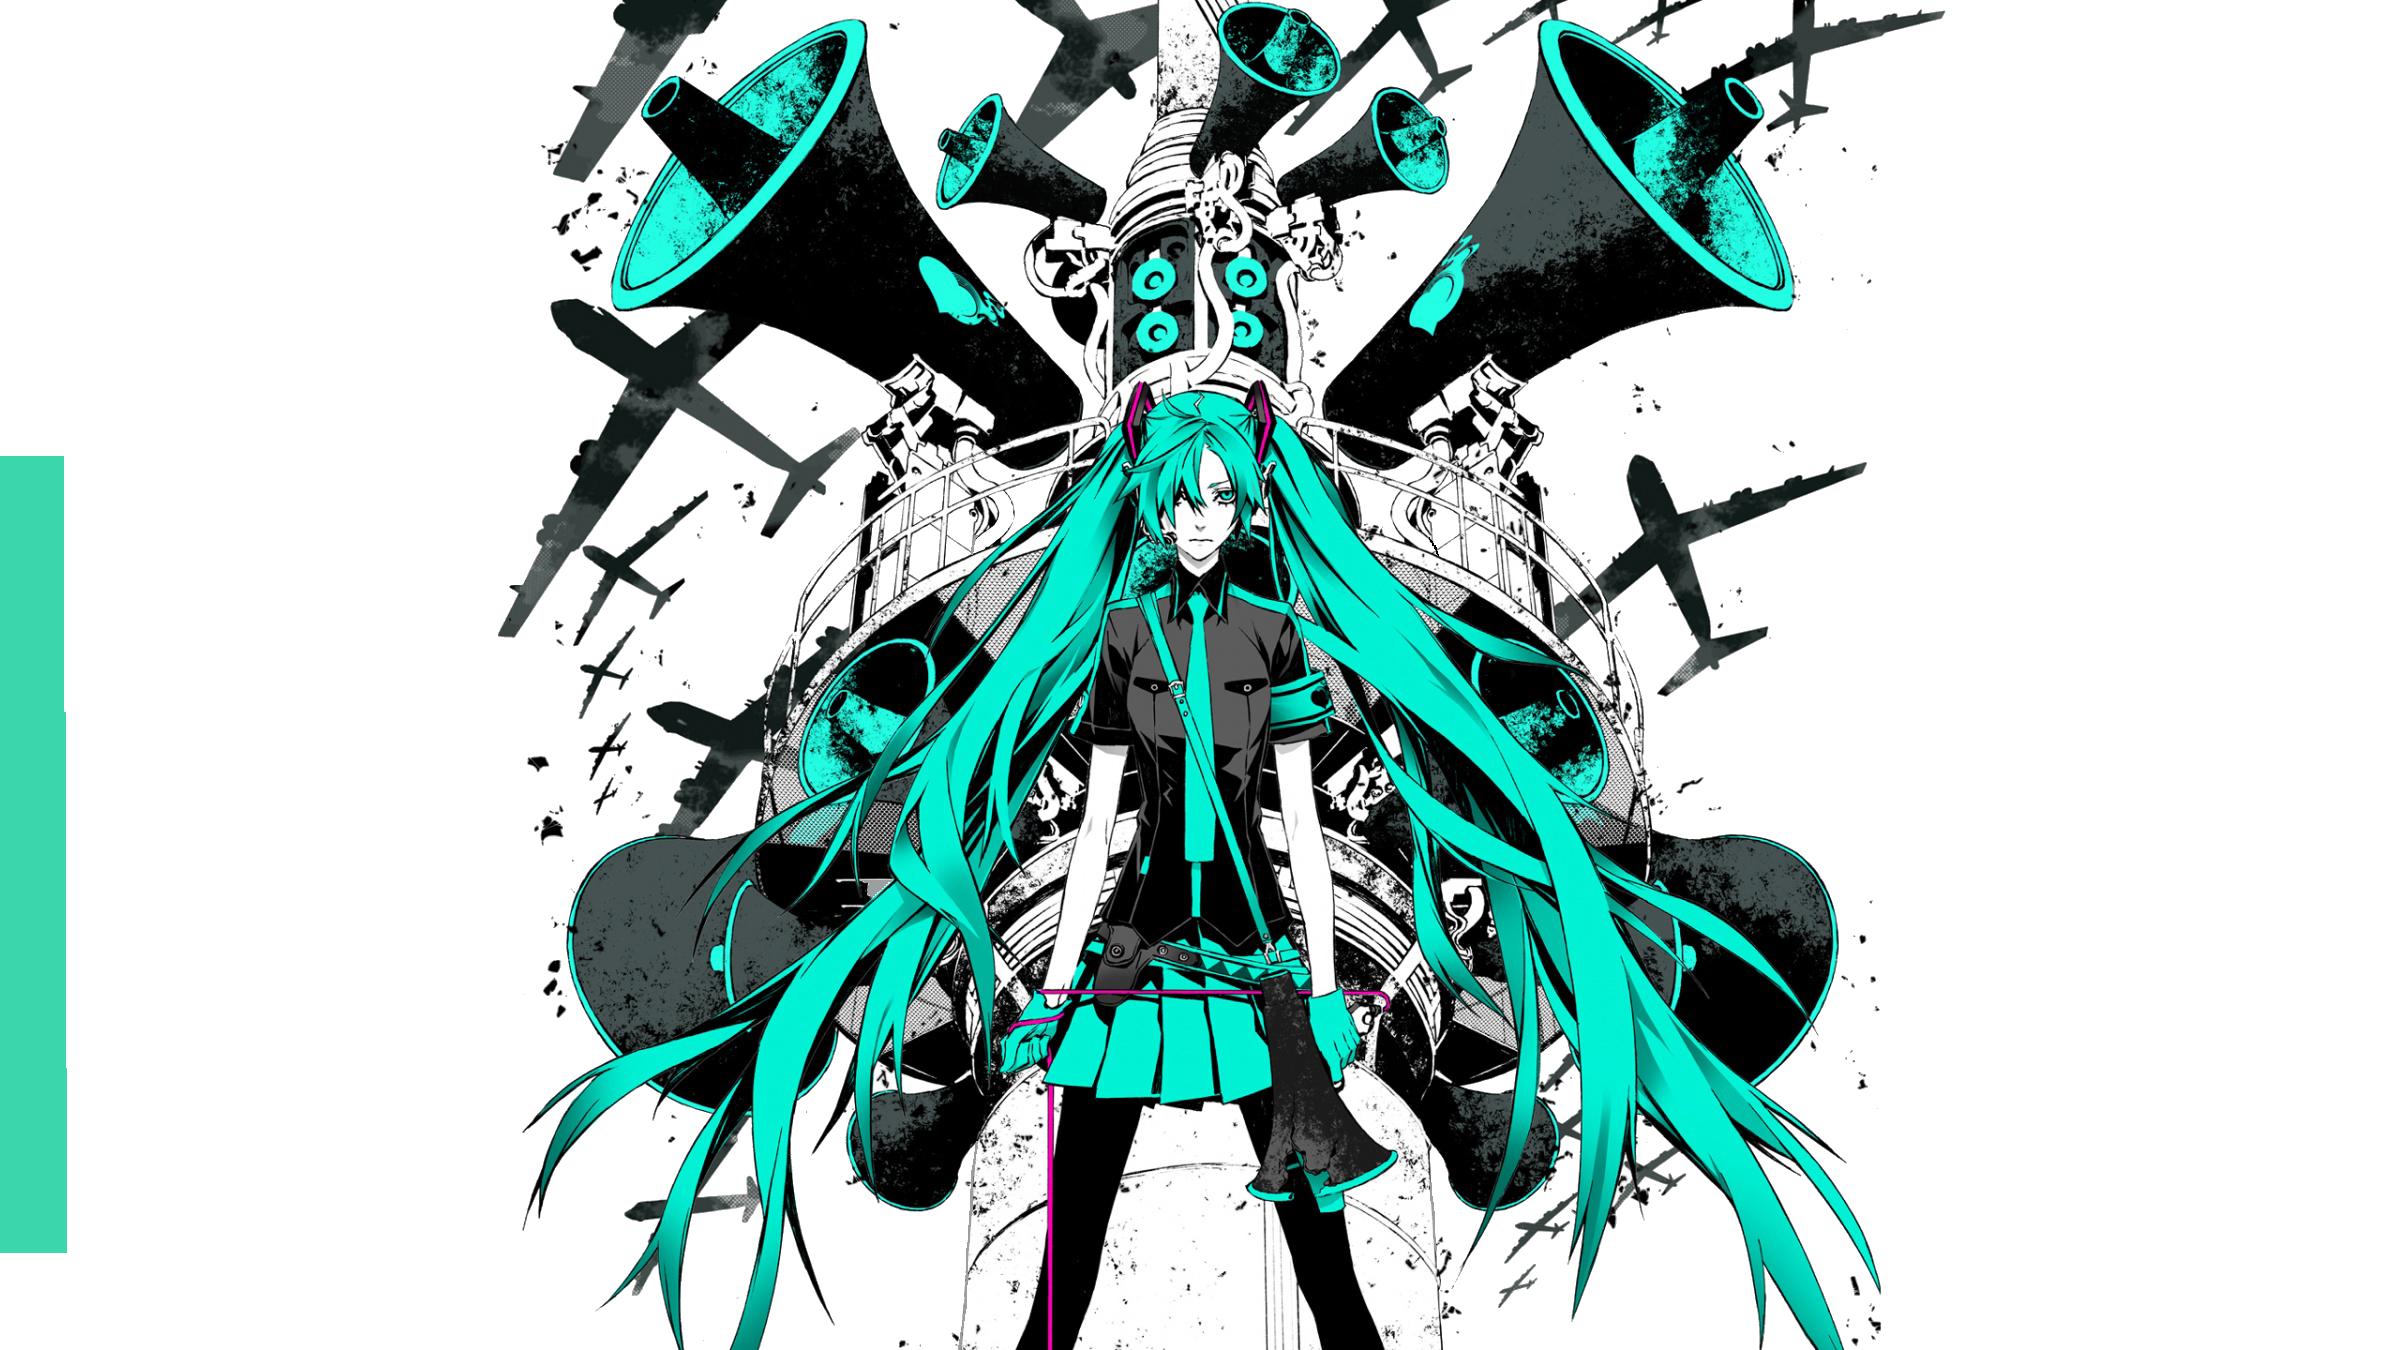 Miku Hatsune Love Is War Render By Ruimei On Deviantart